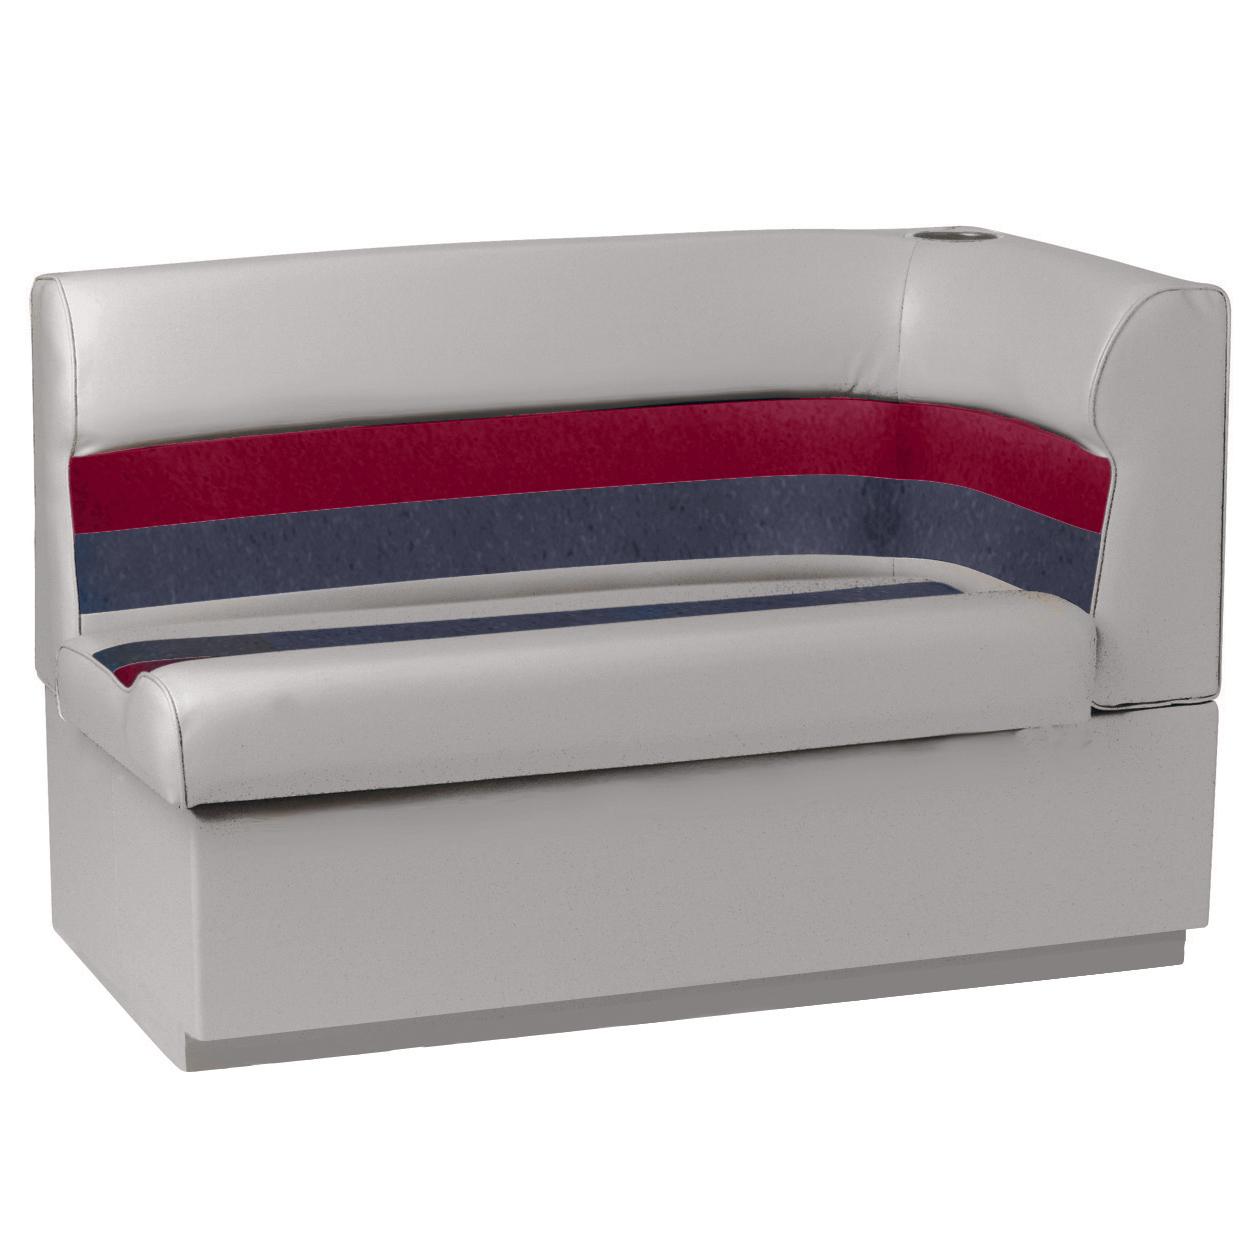 Toonmate Deluxe Pontoon Left-Side Corner Couch Top